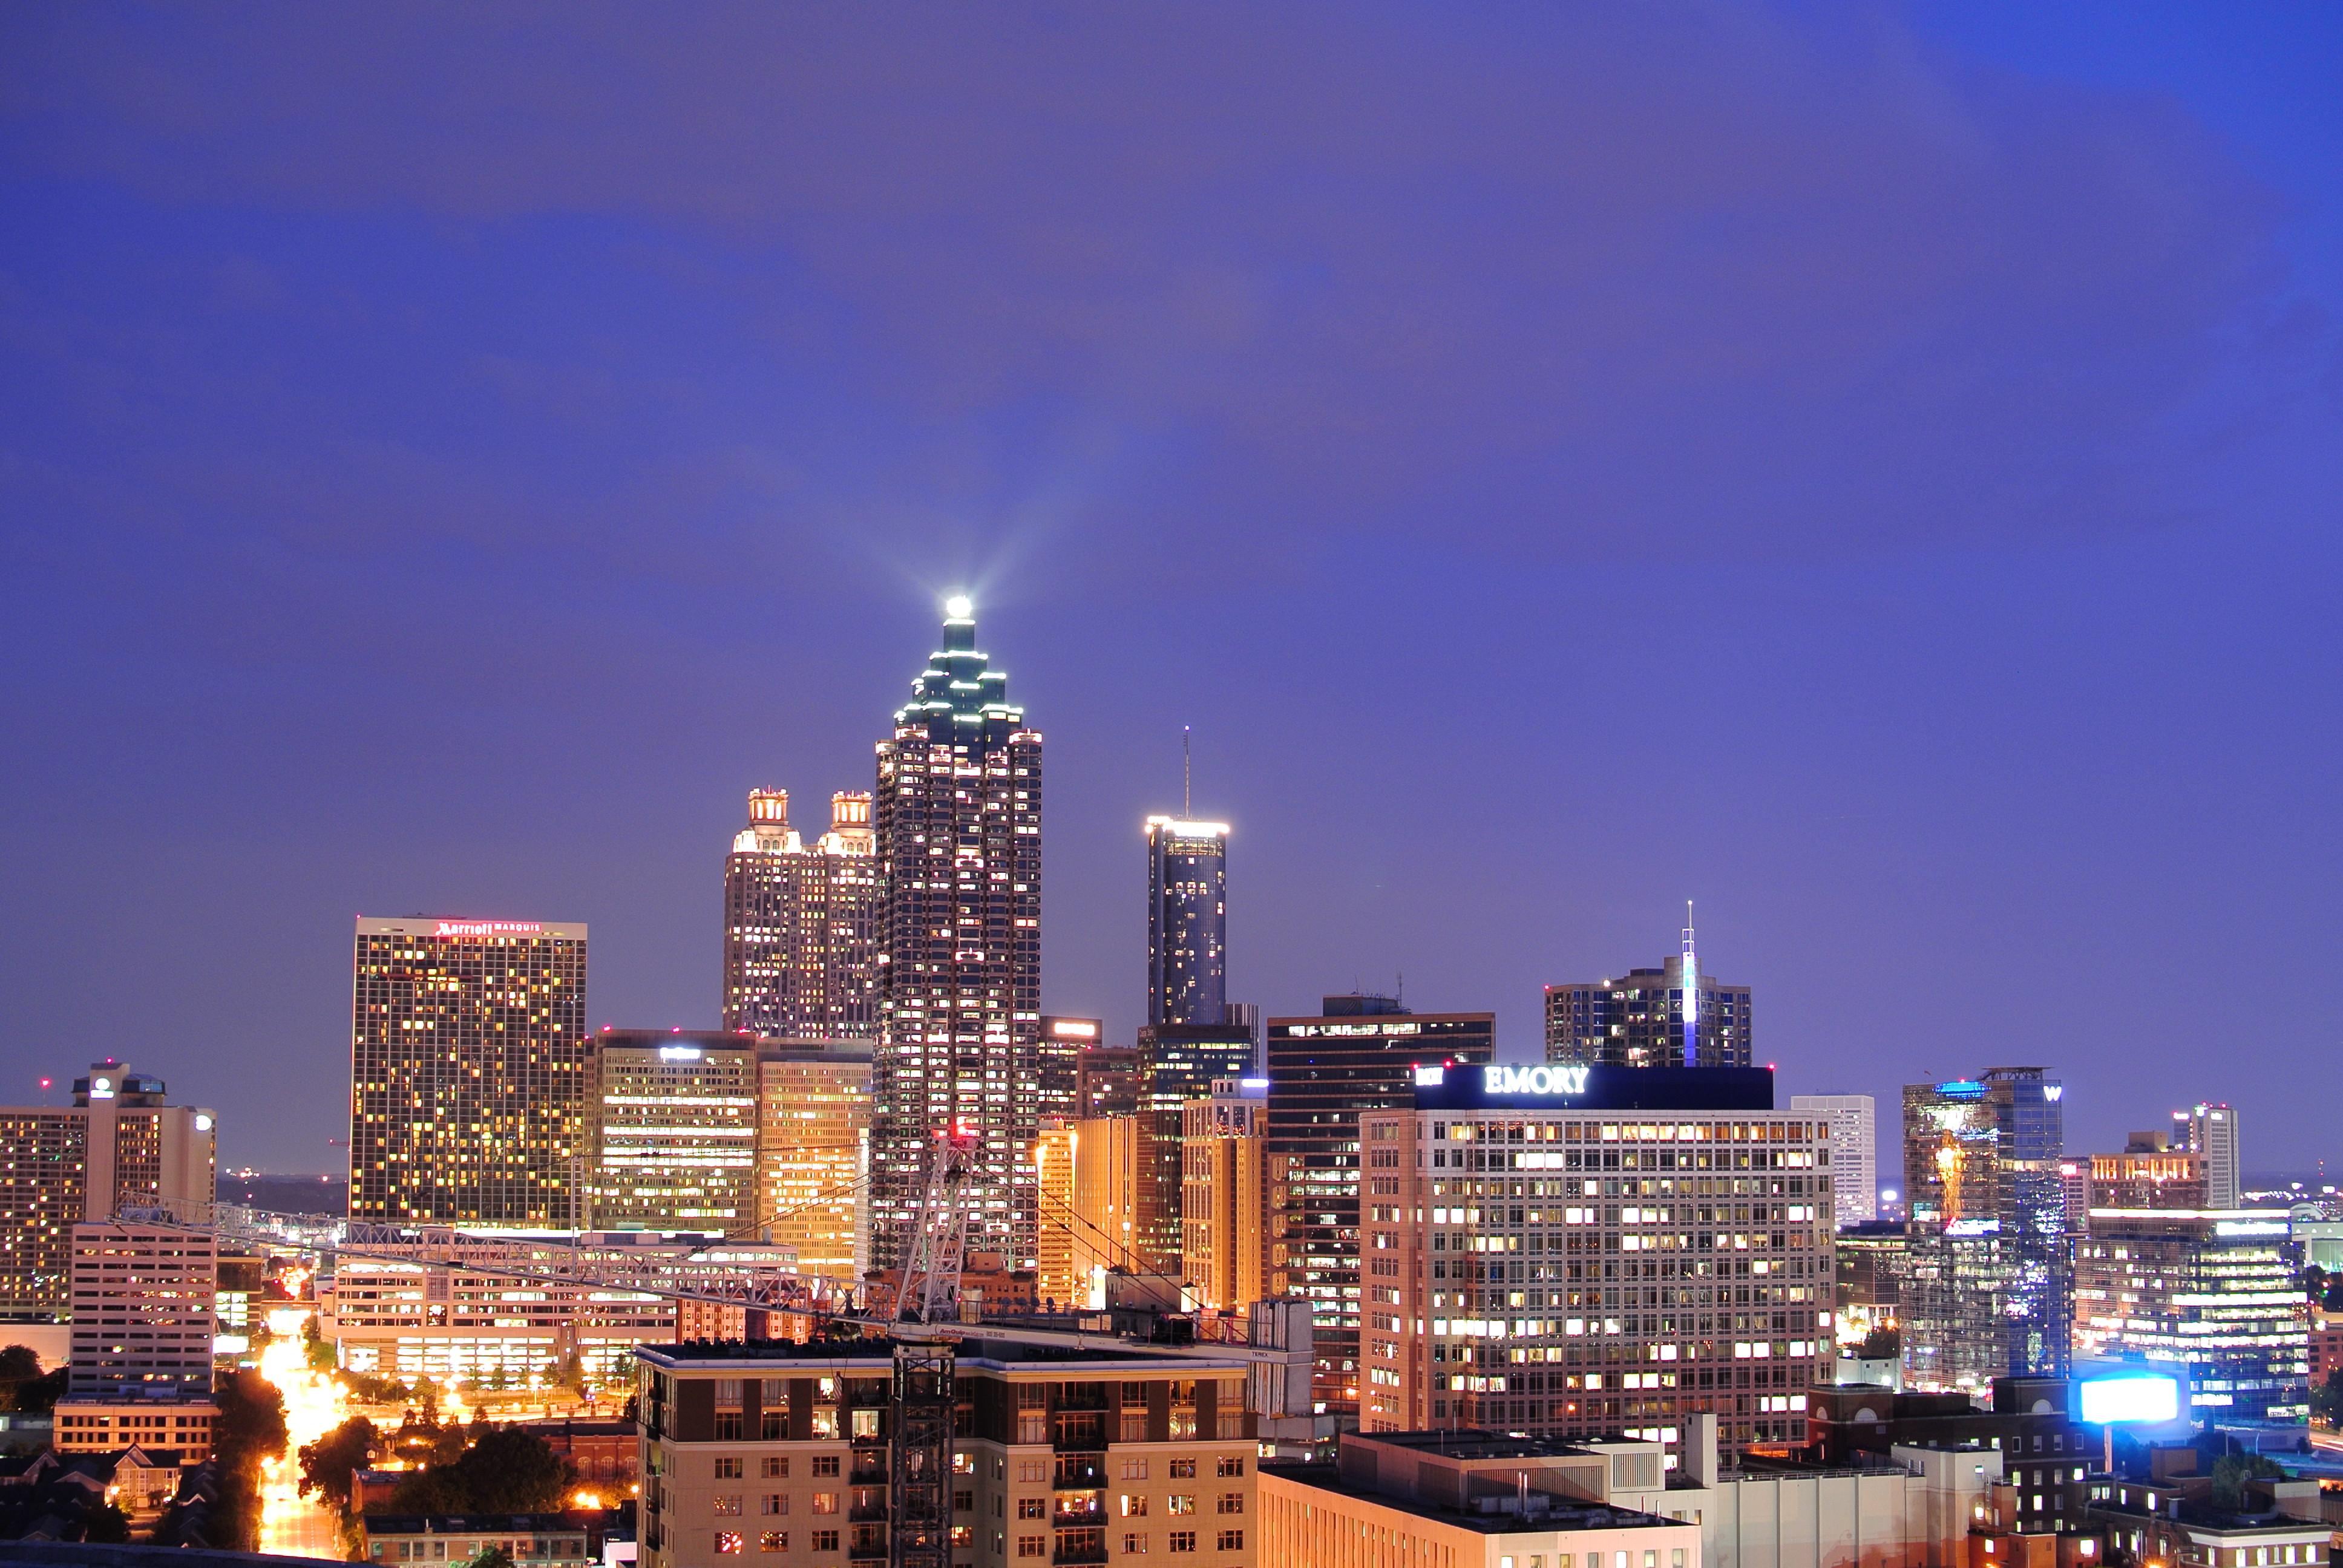 Atlanta evening - 2013